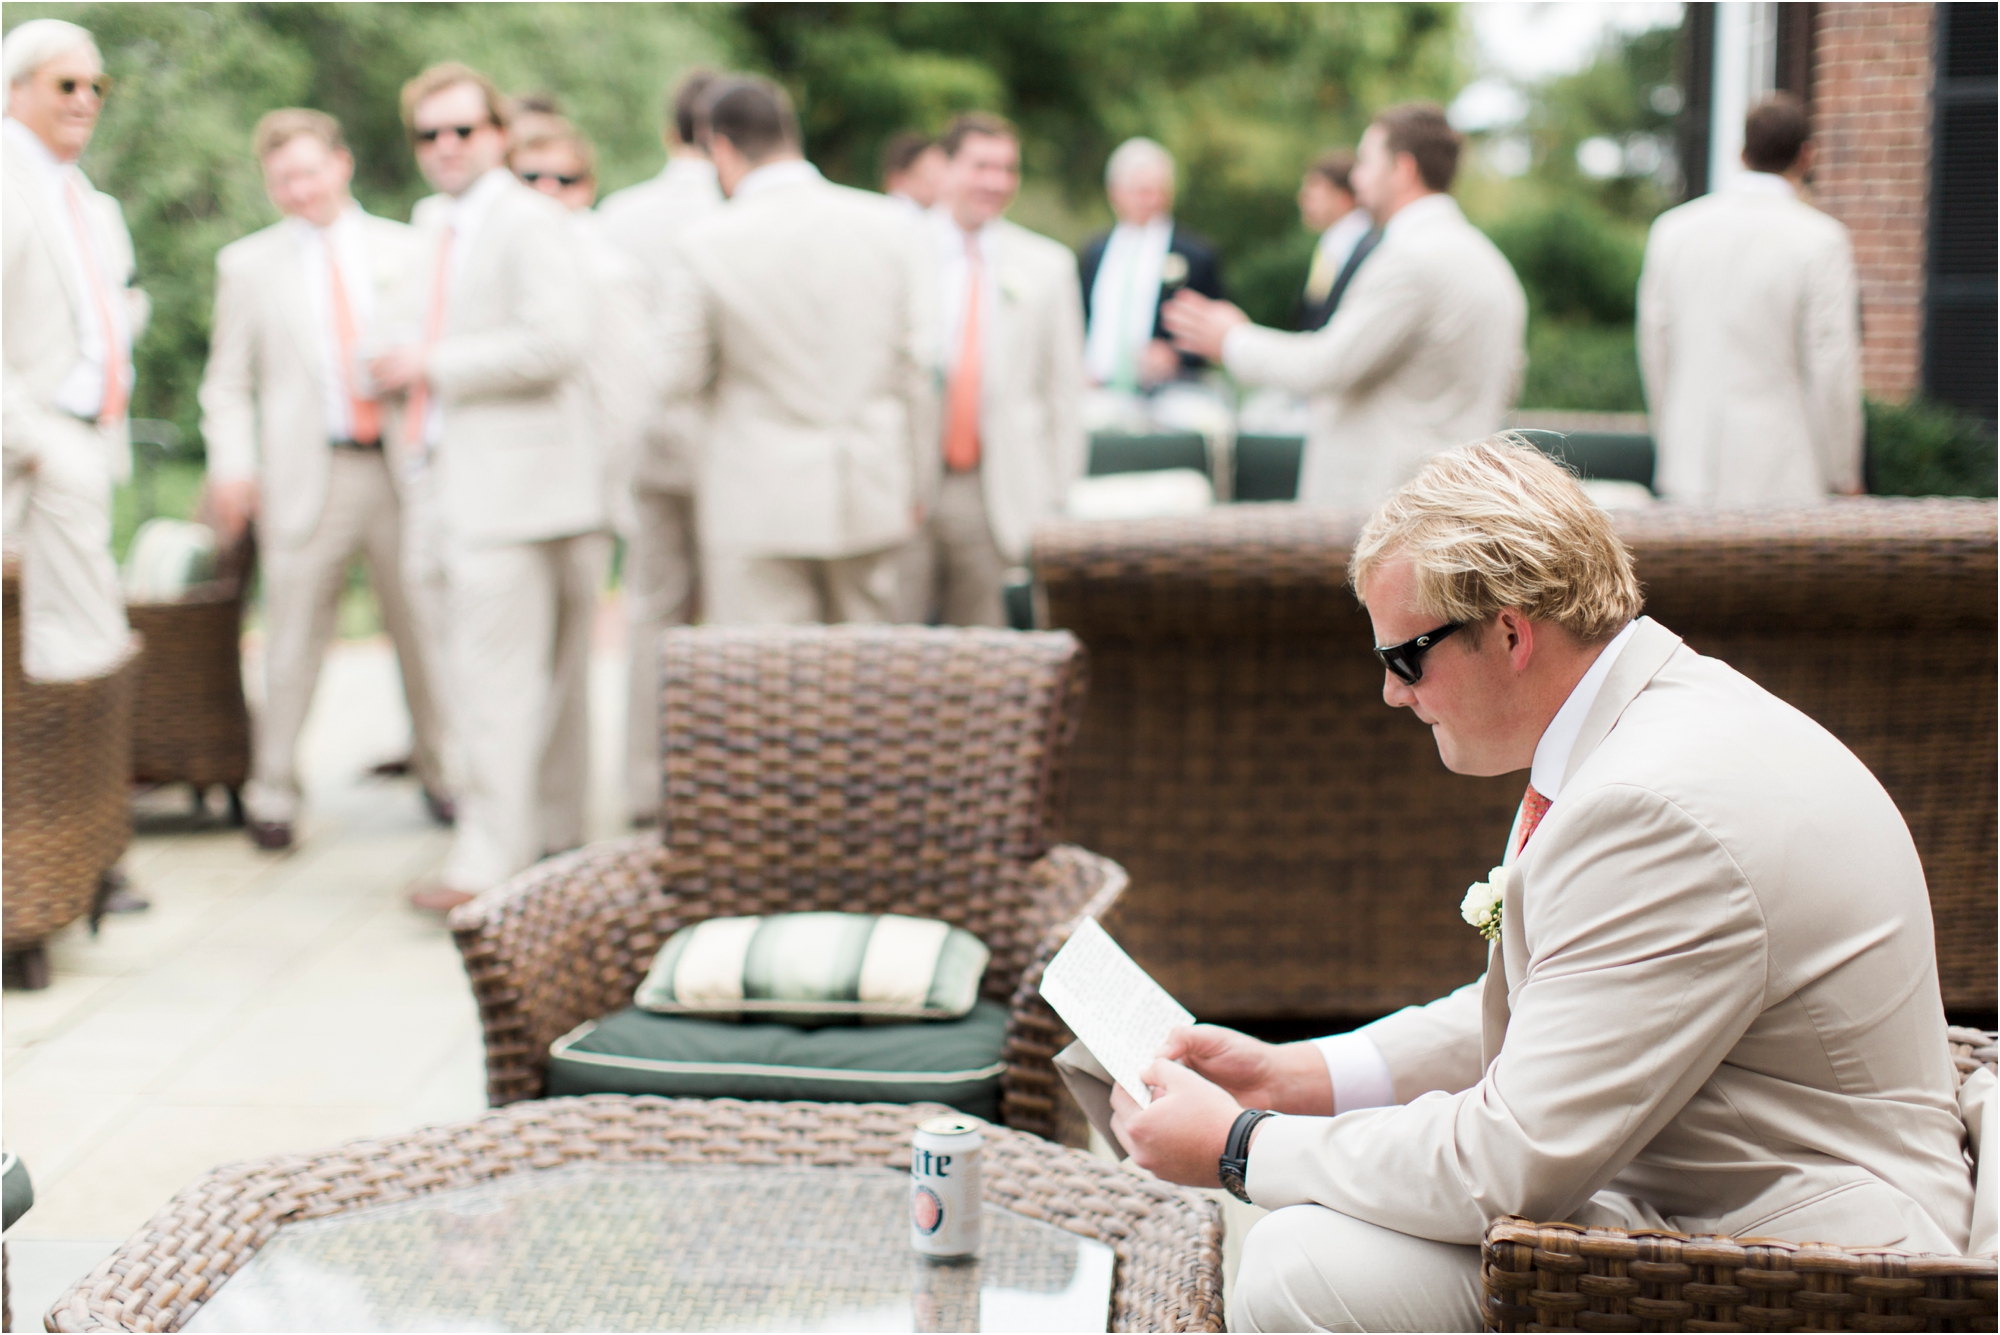 claire-thomas-farmington-country-club-charlottesville-virginia-wedding-photos_0011.jpg